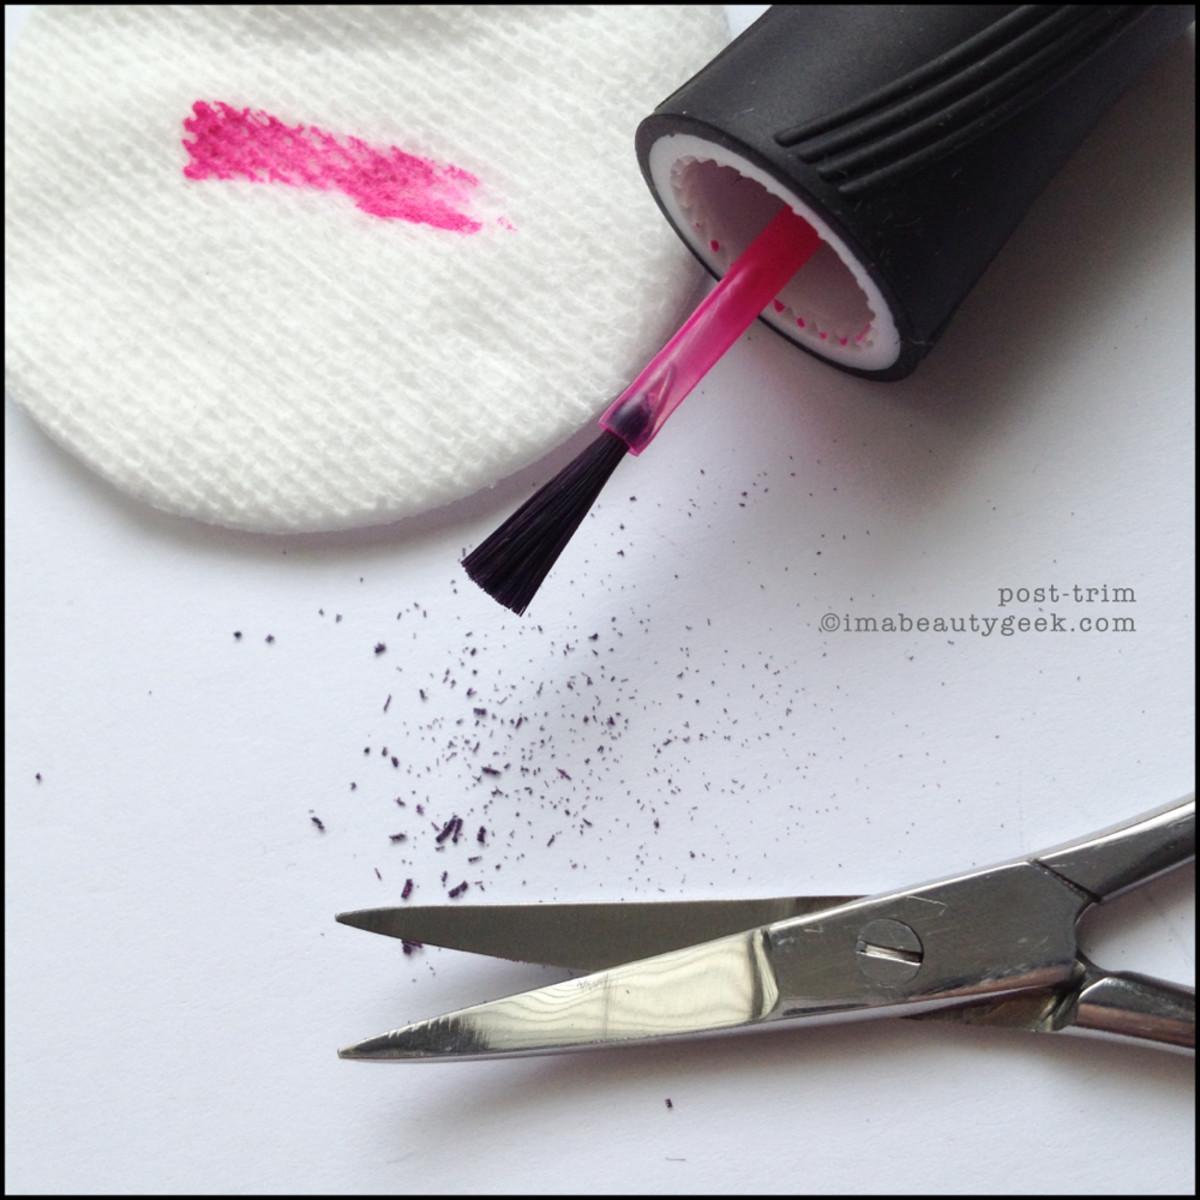 How to trim a nail polish brush_2 Beautygeeks